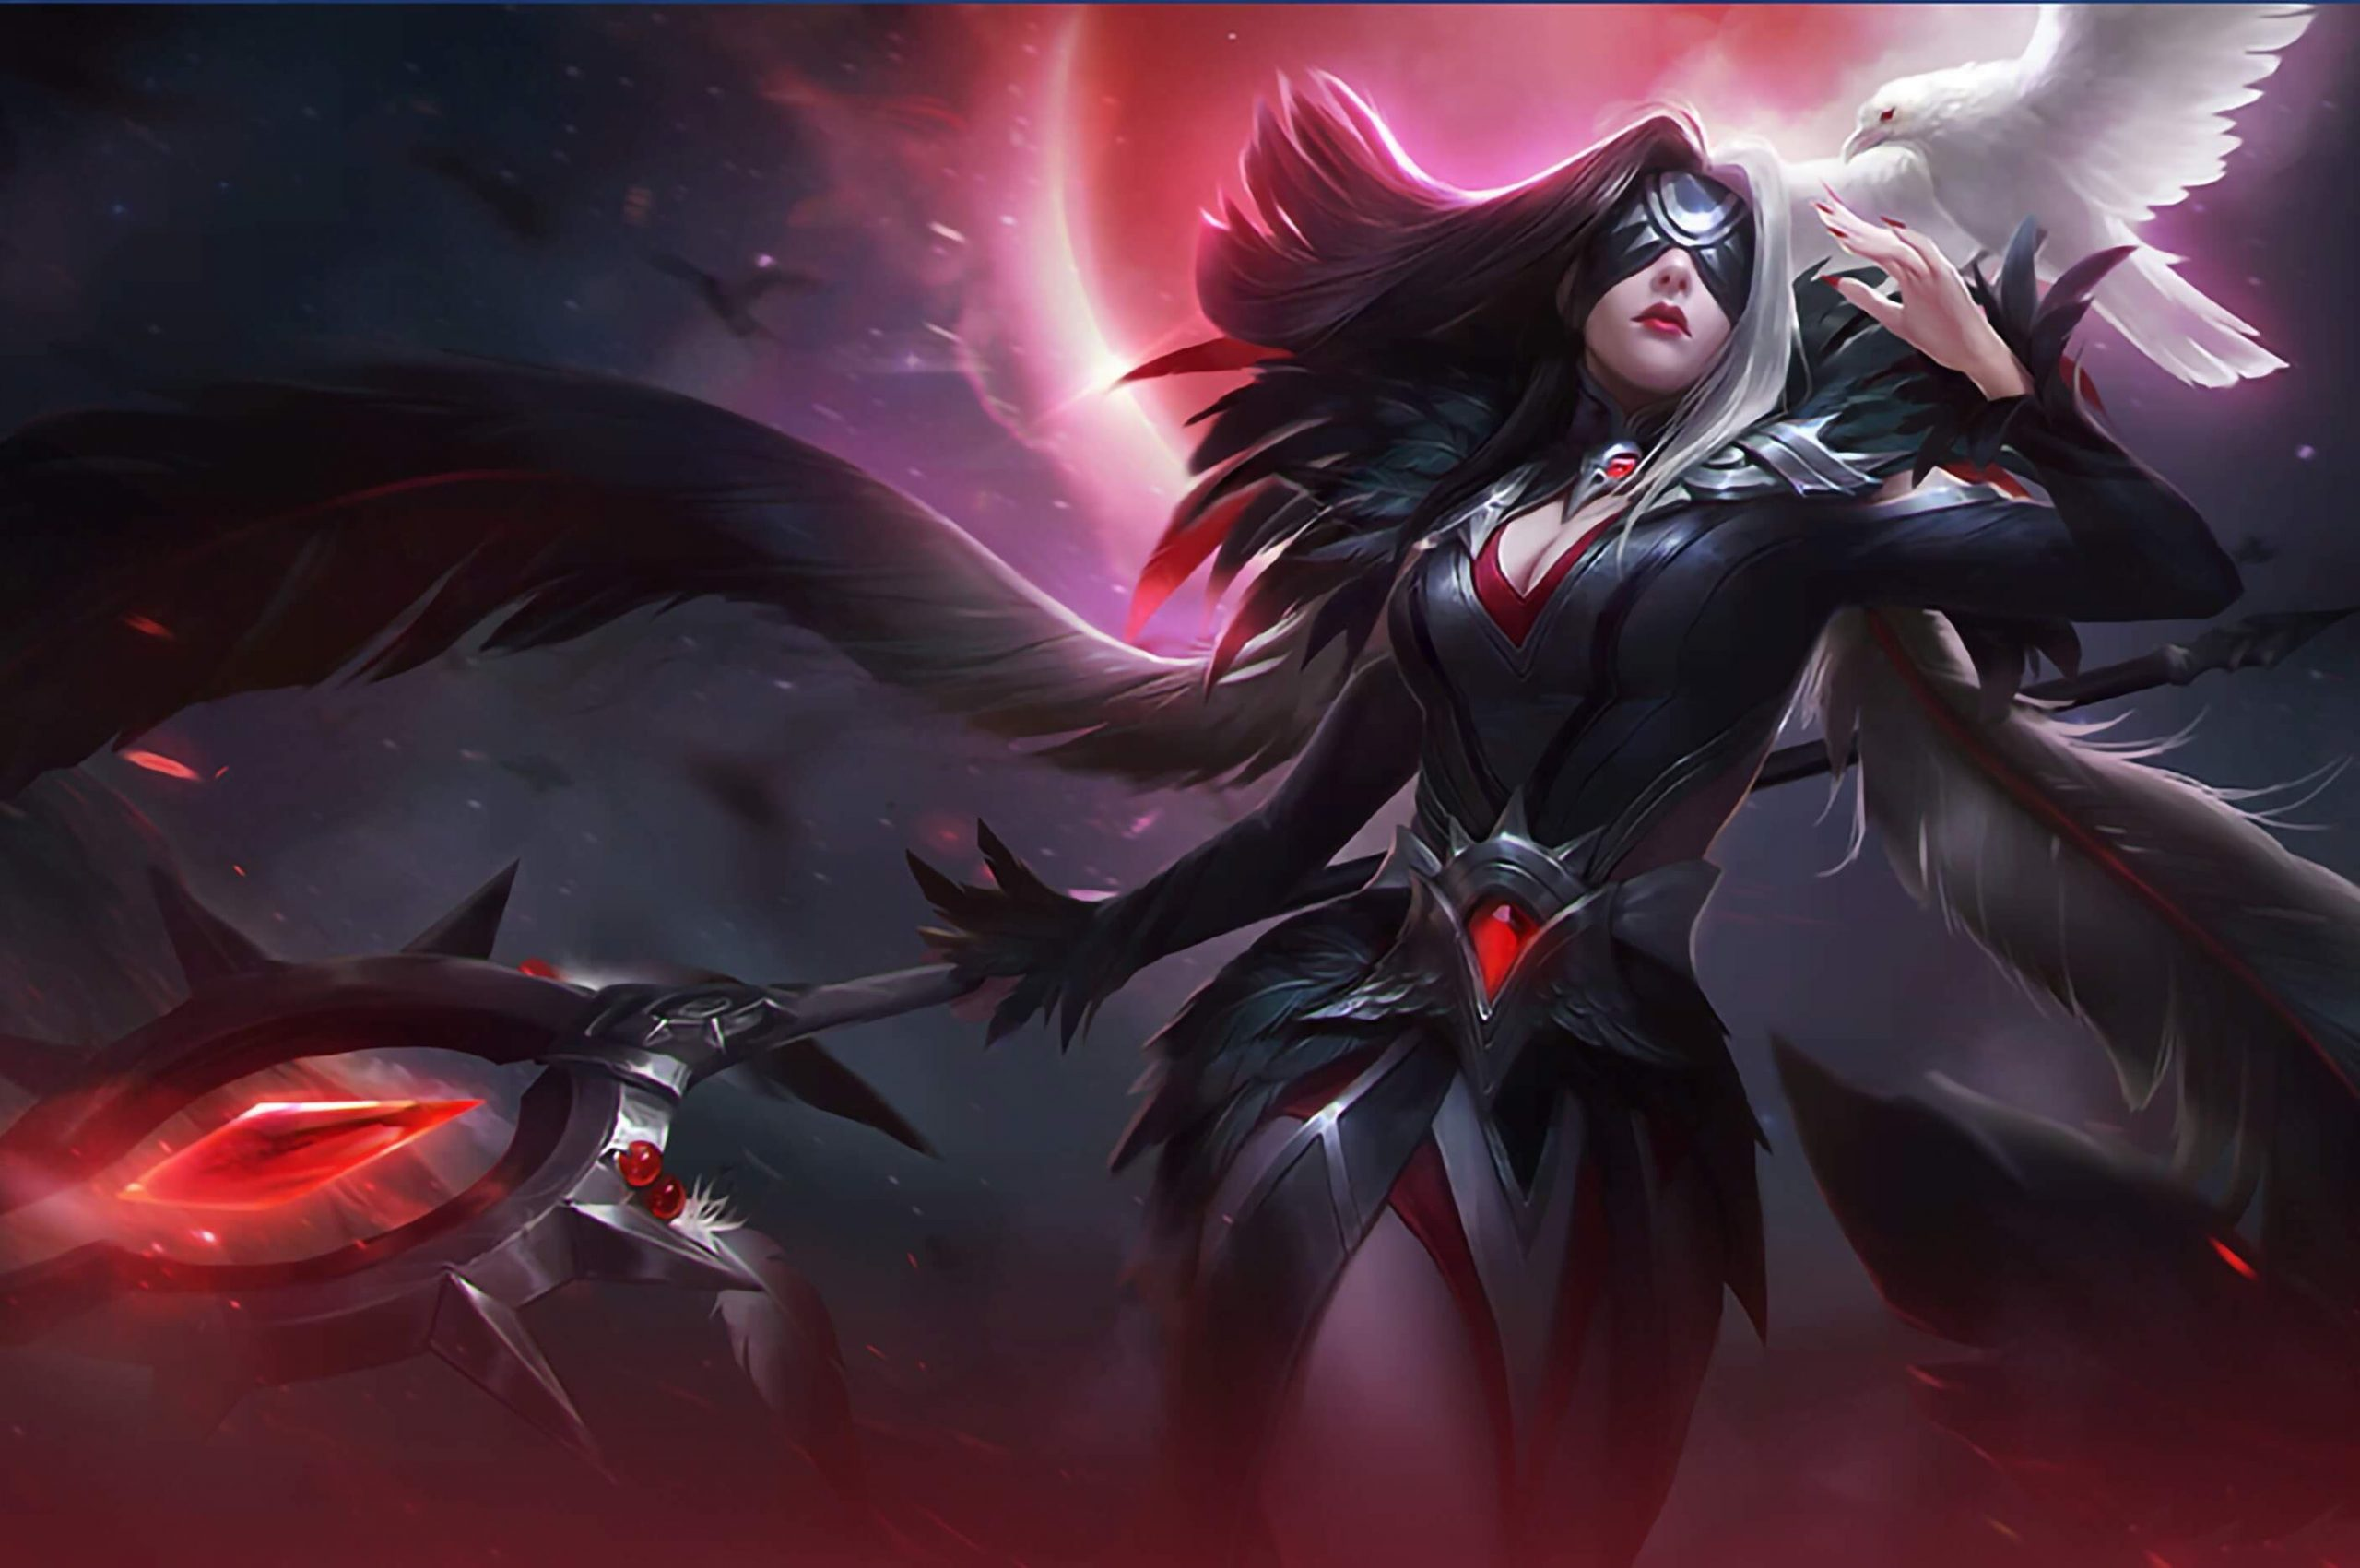 lima hero push rank Mobile Legends